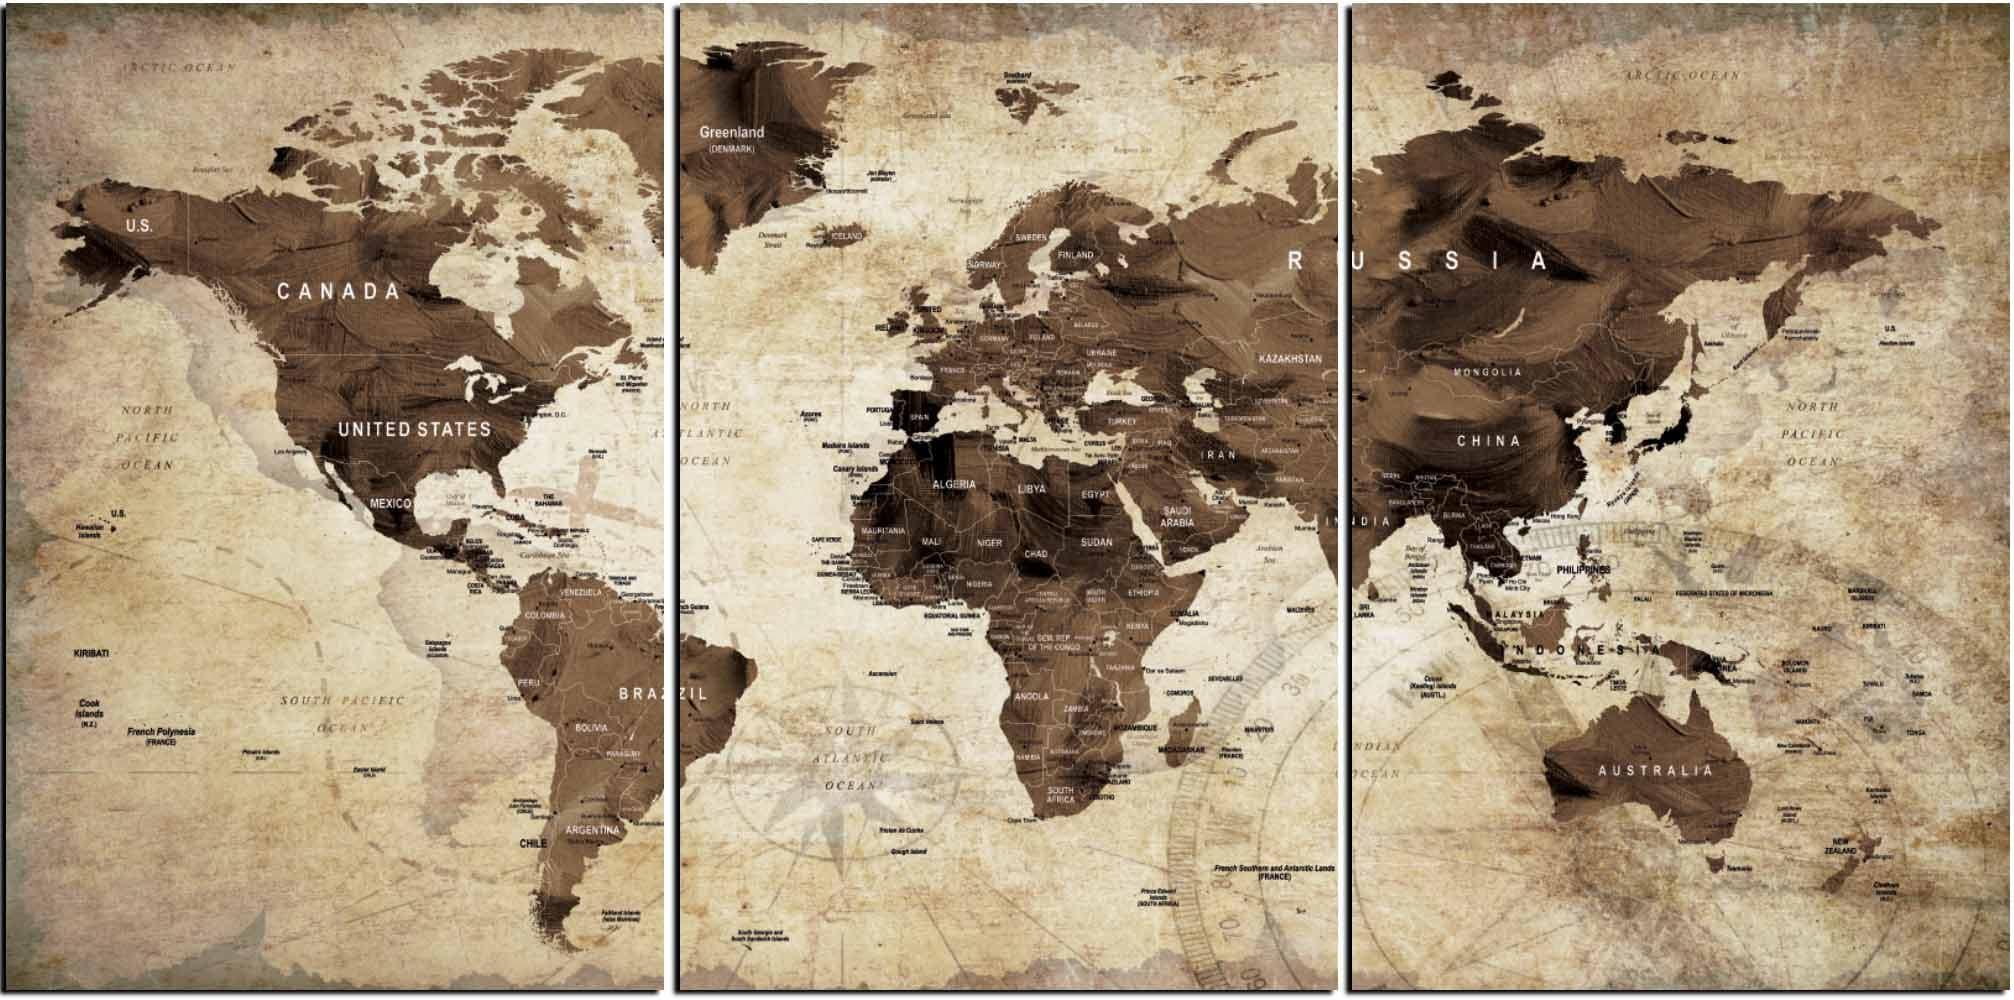 World mapworld map vintagevintage map artworld map wall artworld world mapworld map vintagevintage map artworld map wall artworld map canvas artworld map printbrown world mapold world map wall art gumiabroncs Gallery